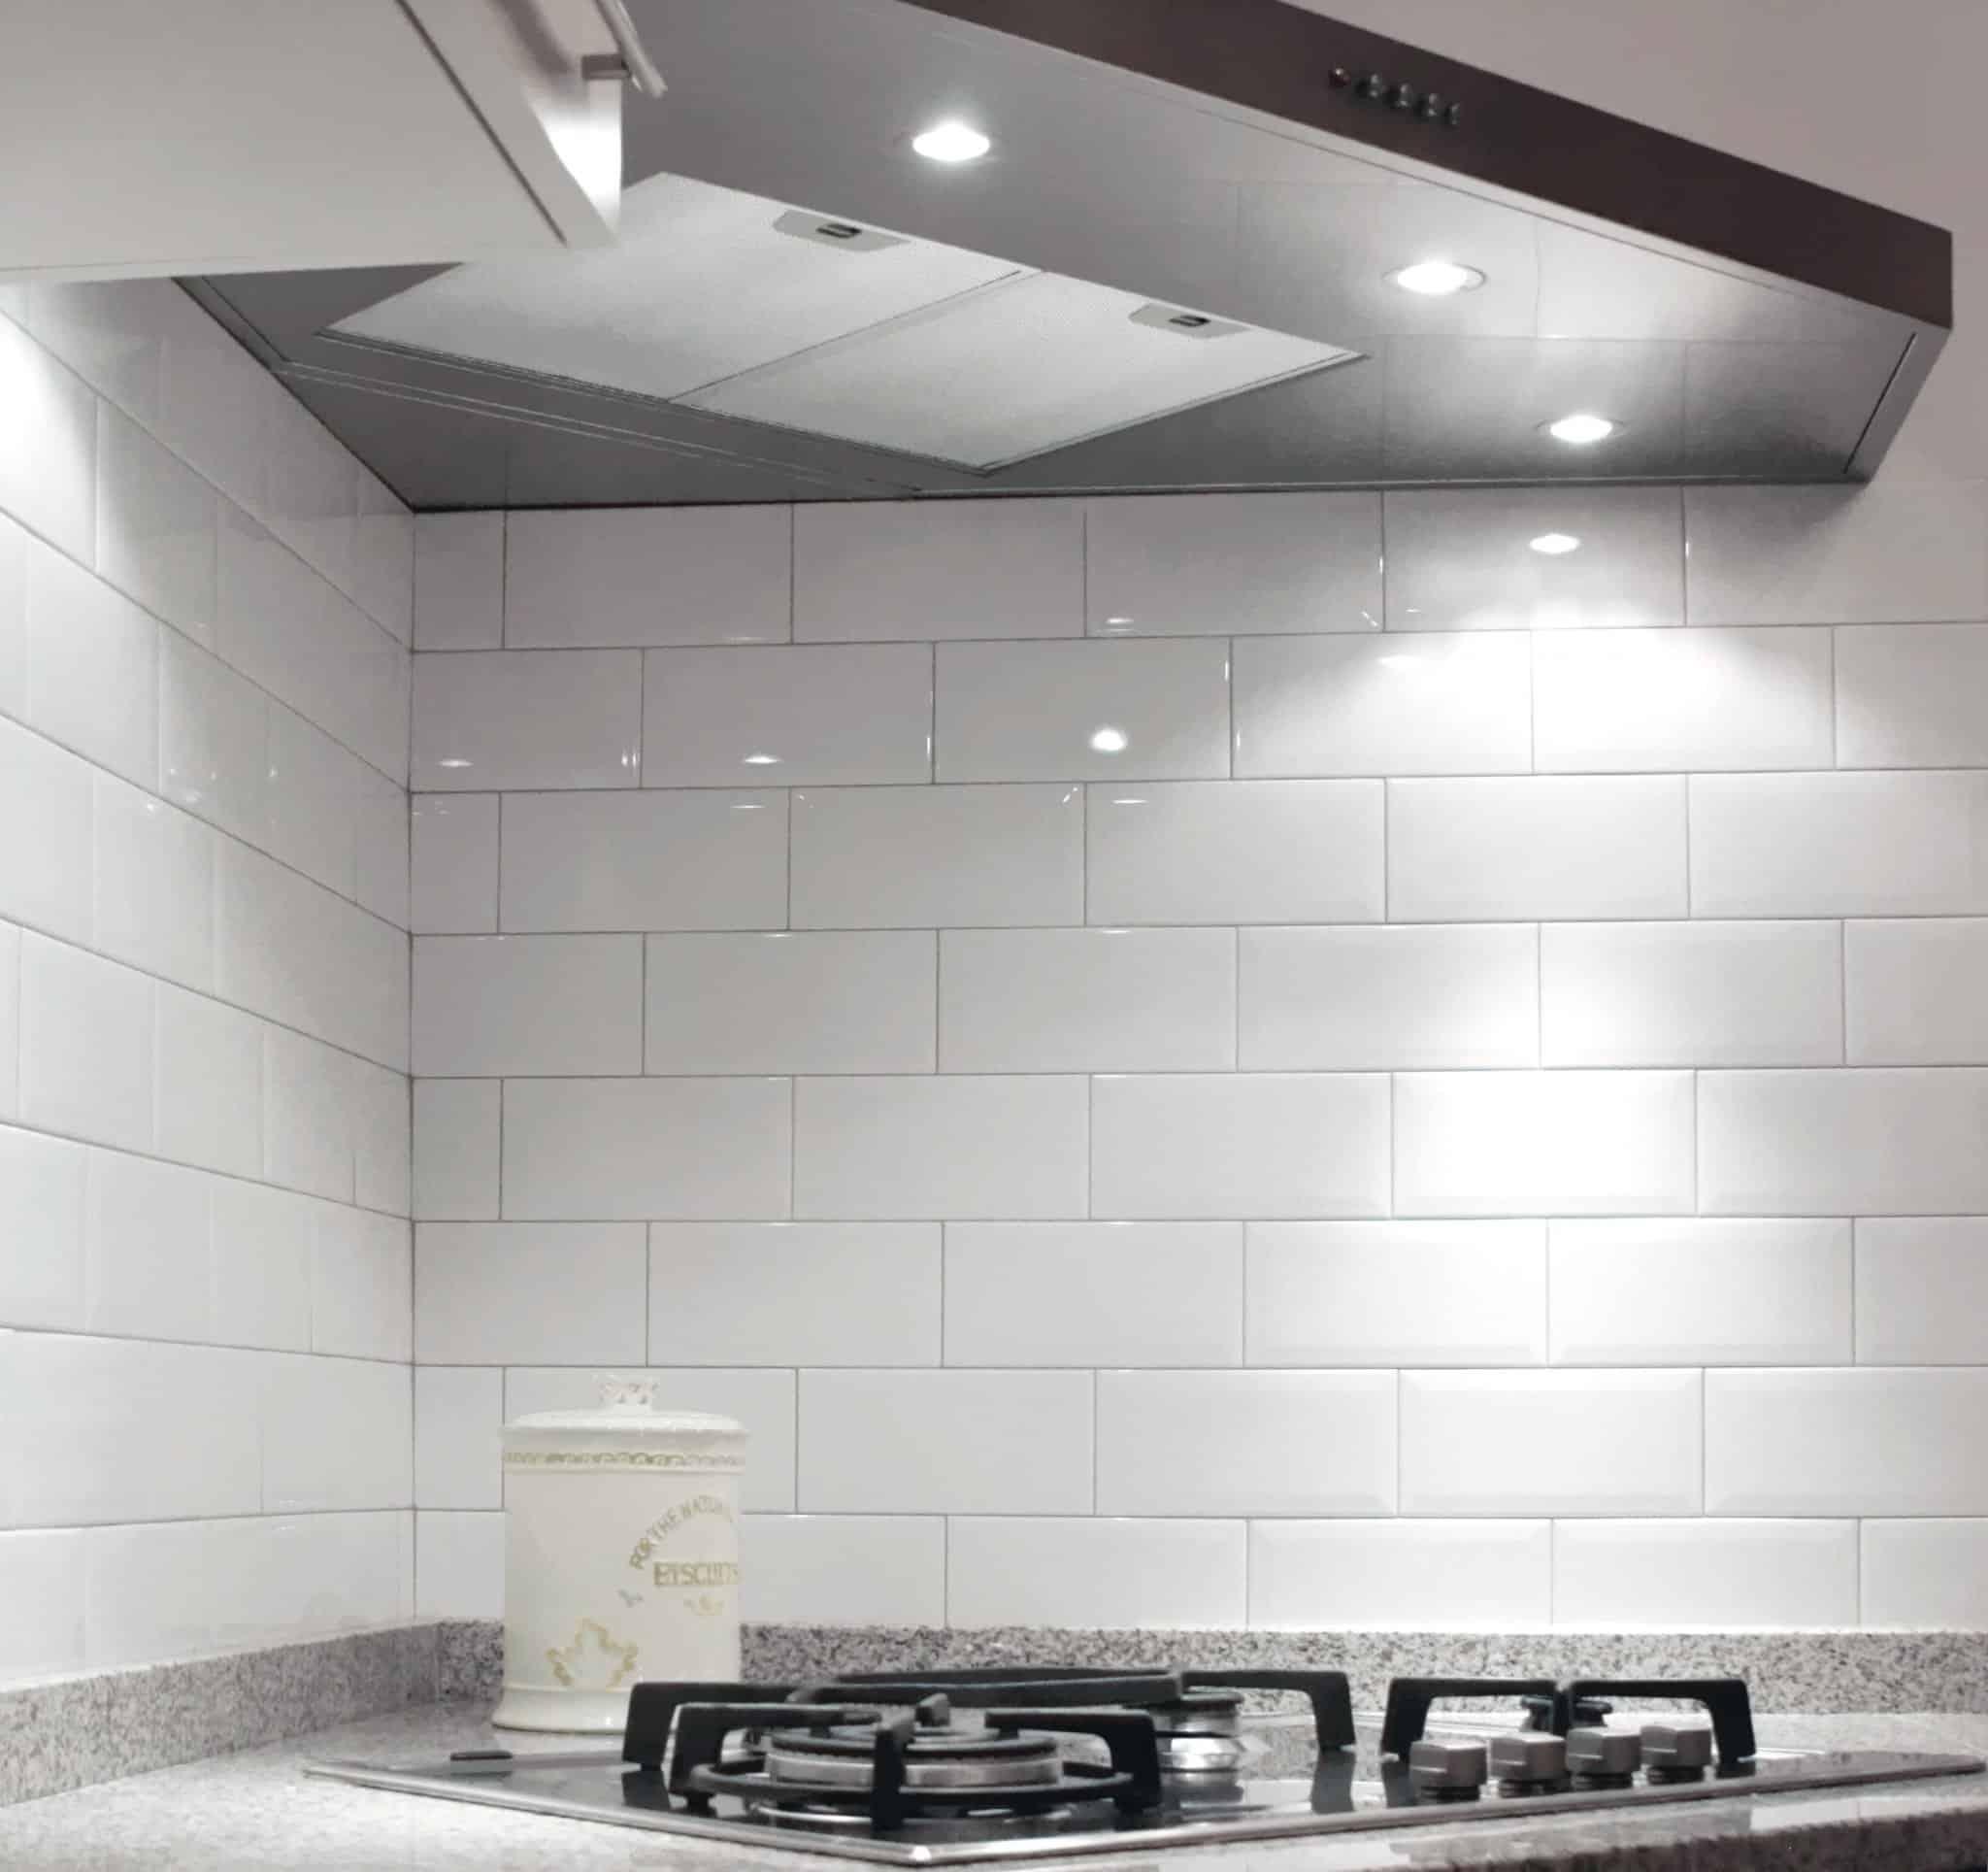 diamante rivestimento cucina bianco mosaico 2 - Musis Ceramica